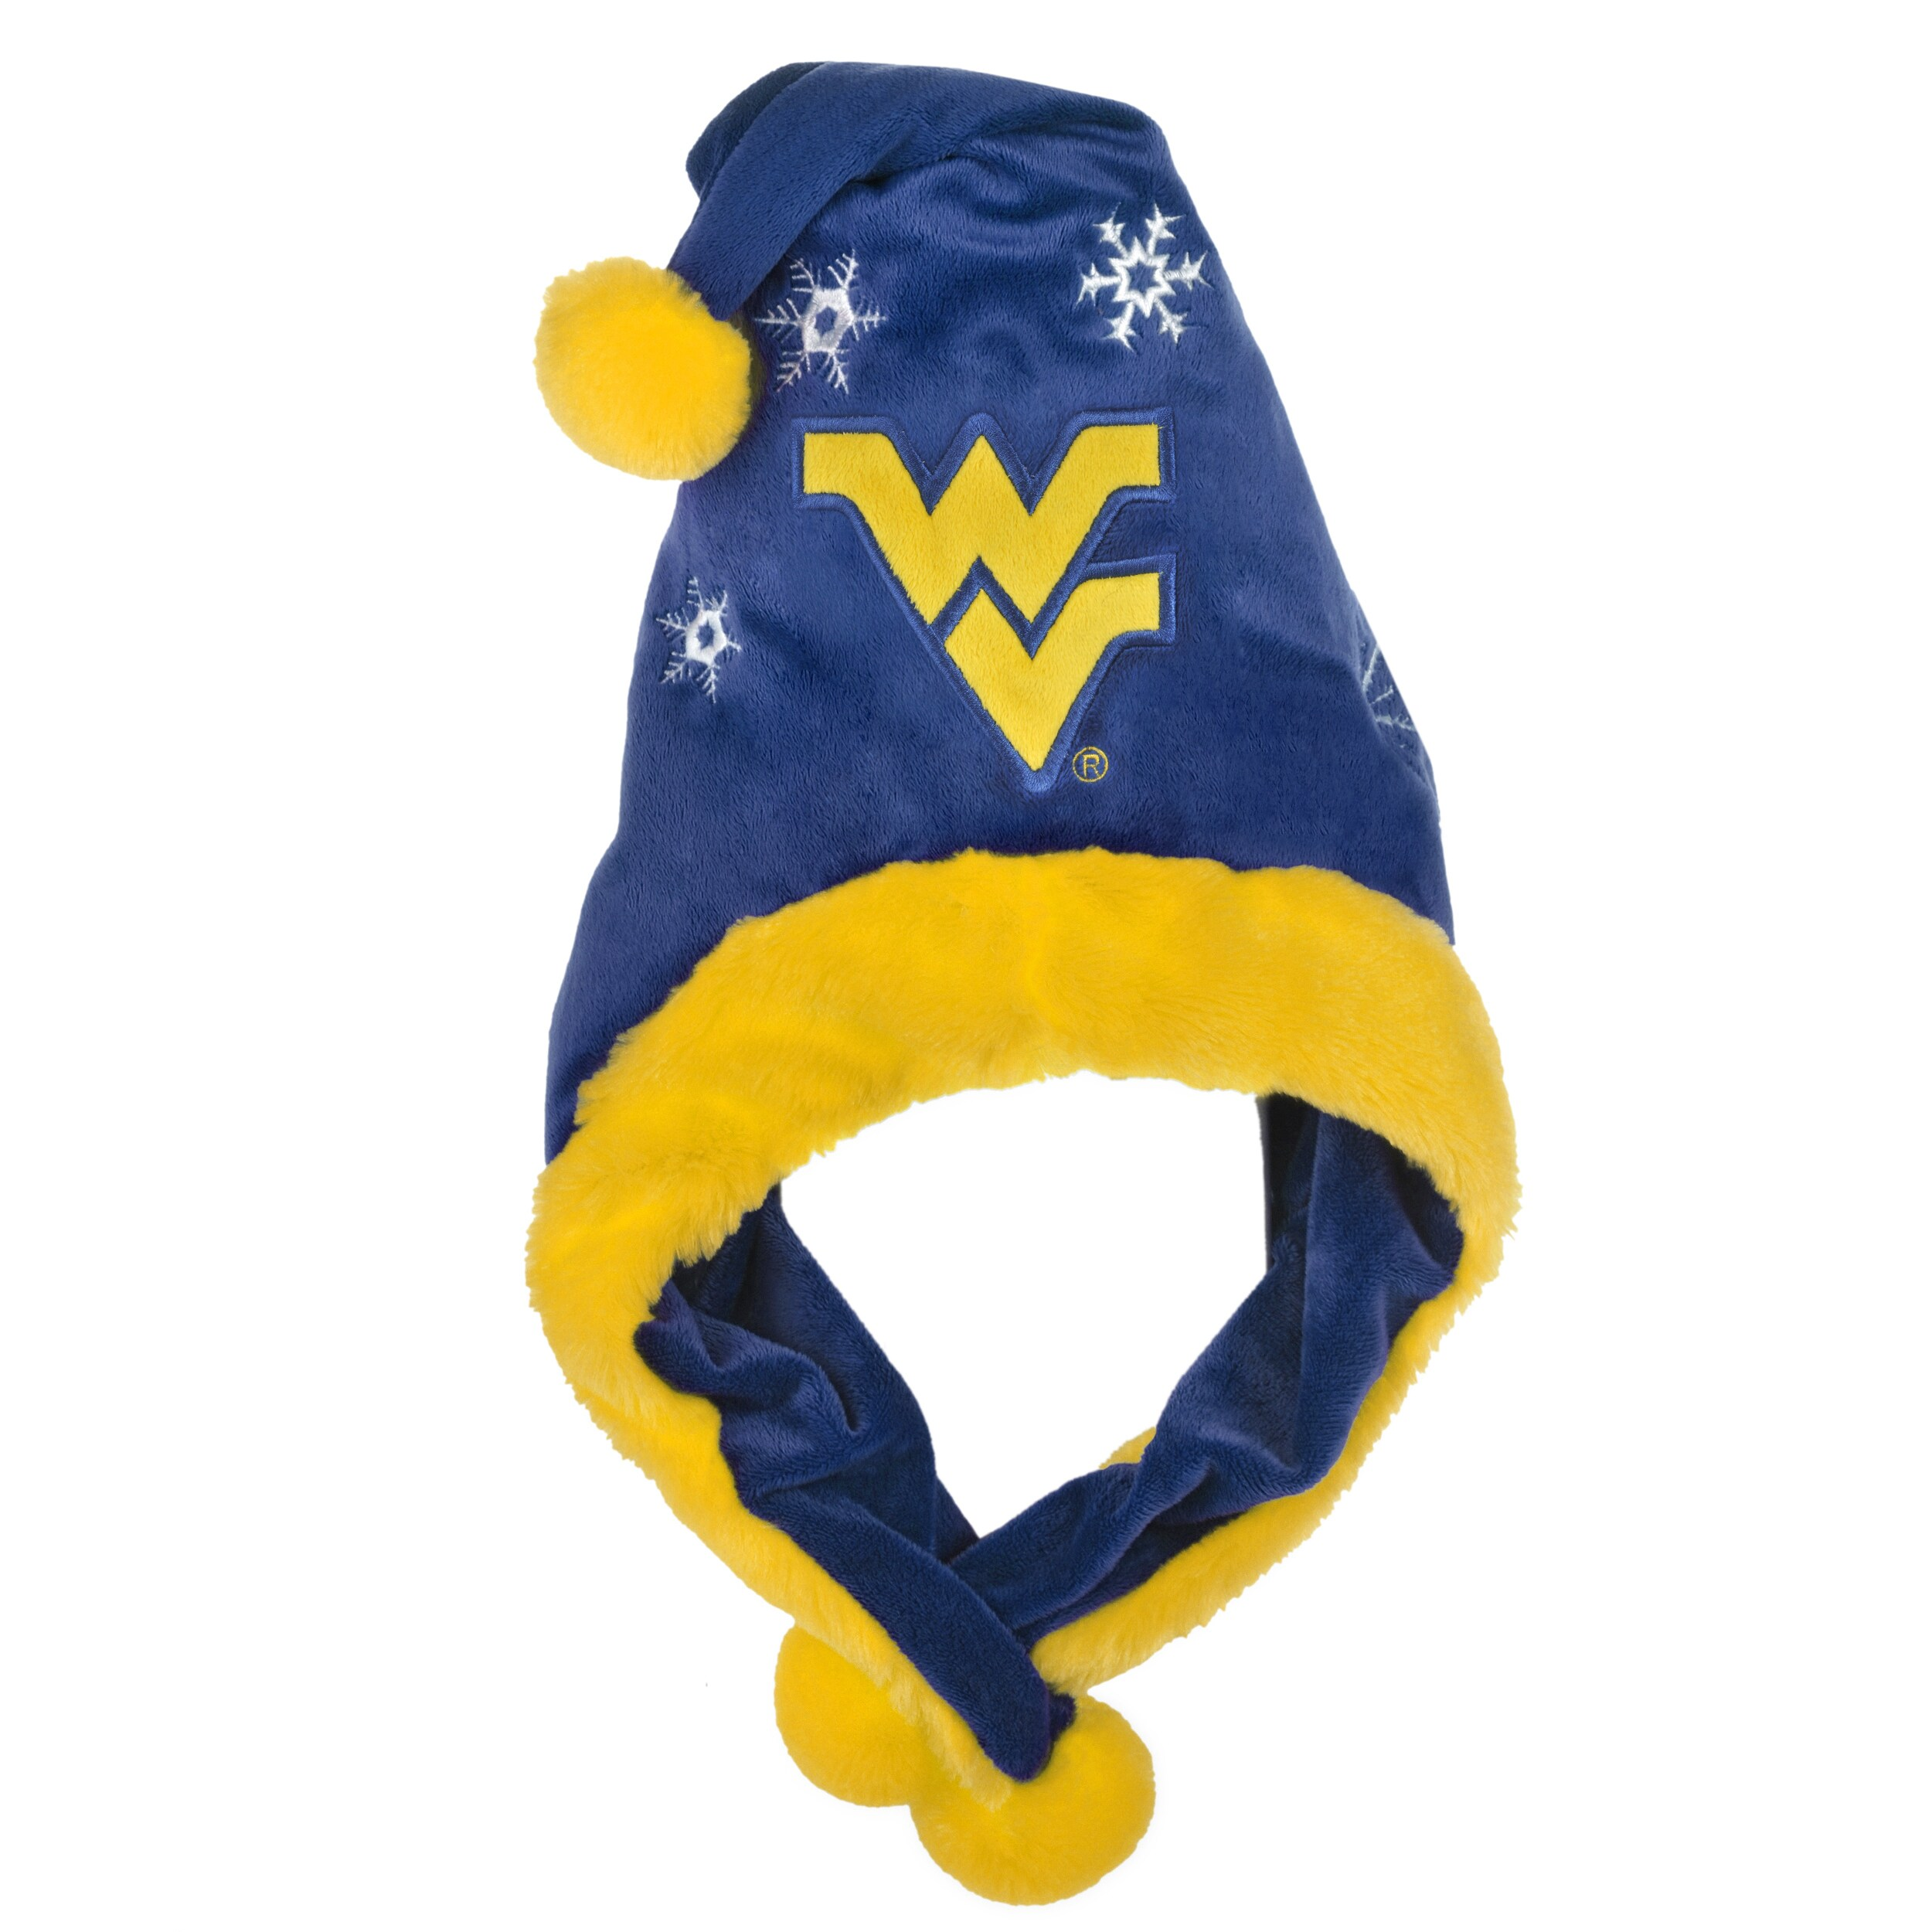 West Virginia Mountaineers Thematic Santa Hat